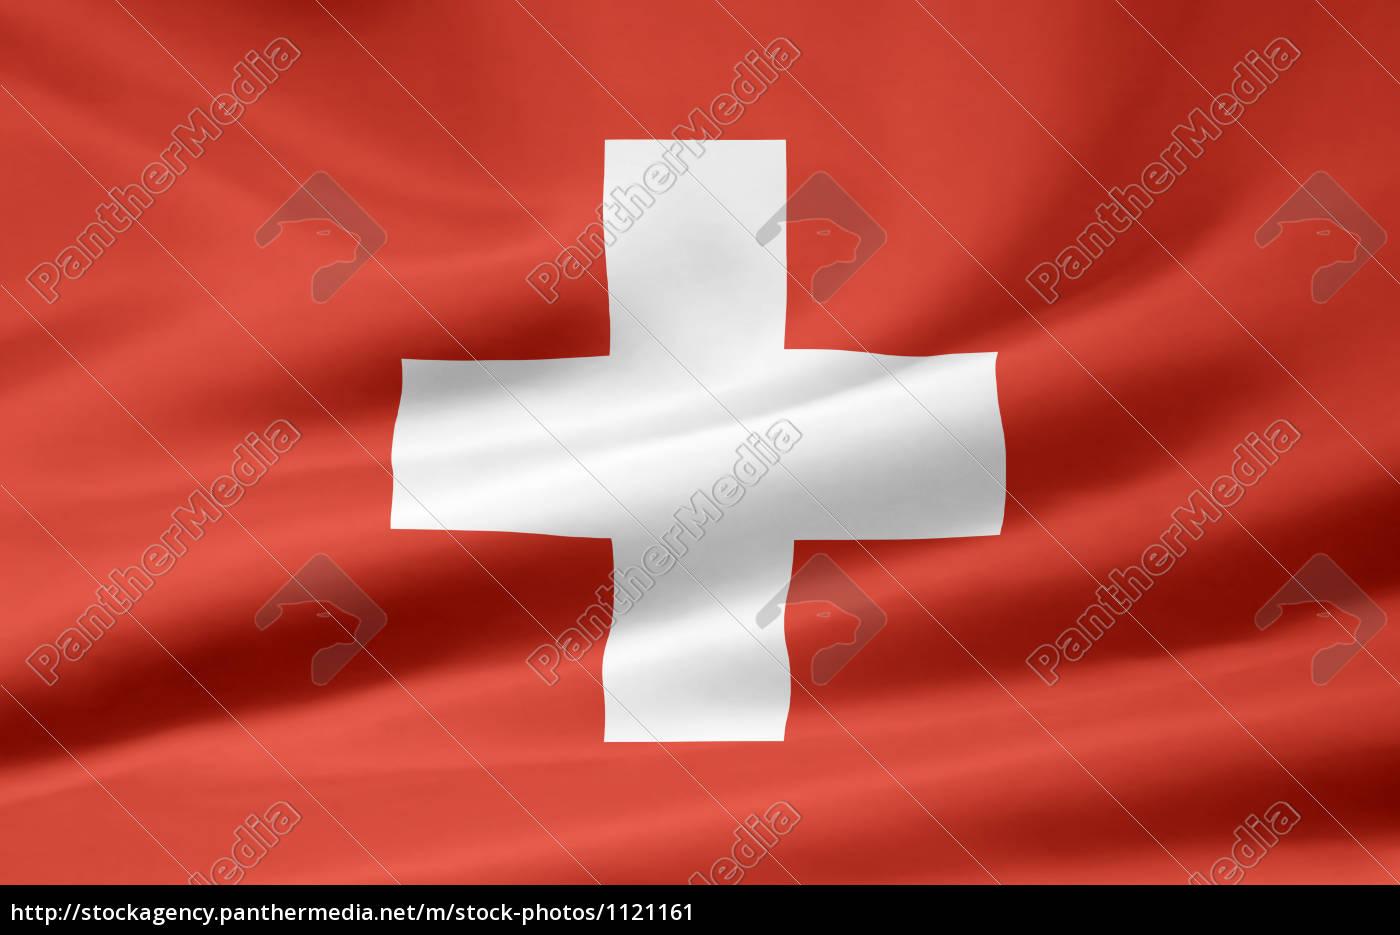 swiss, flag - 1121161